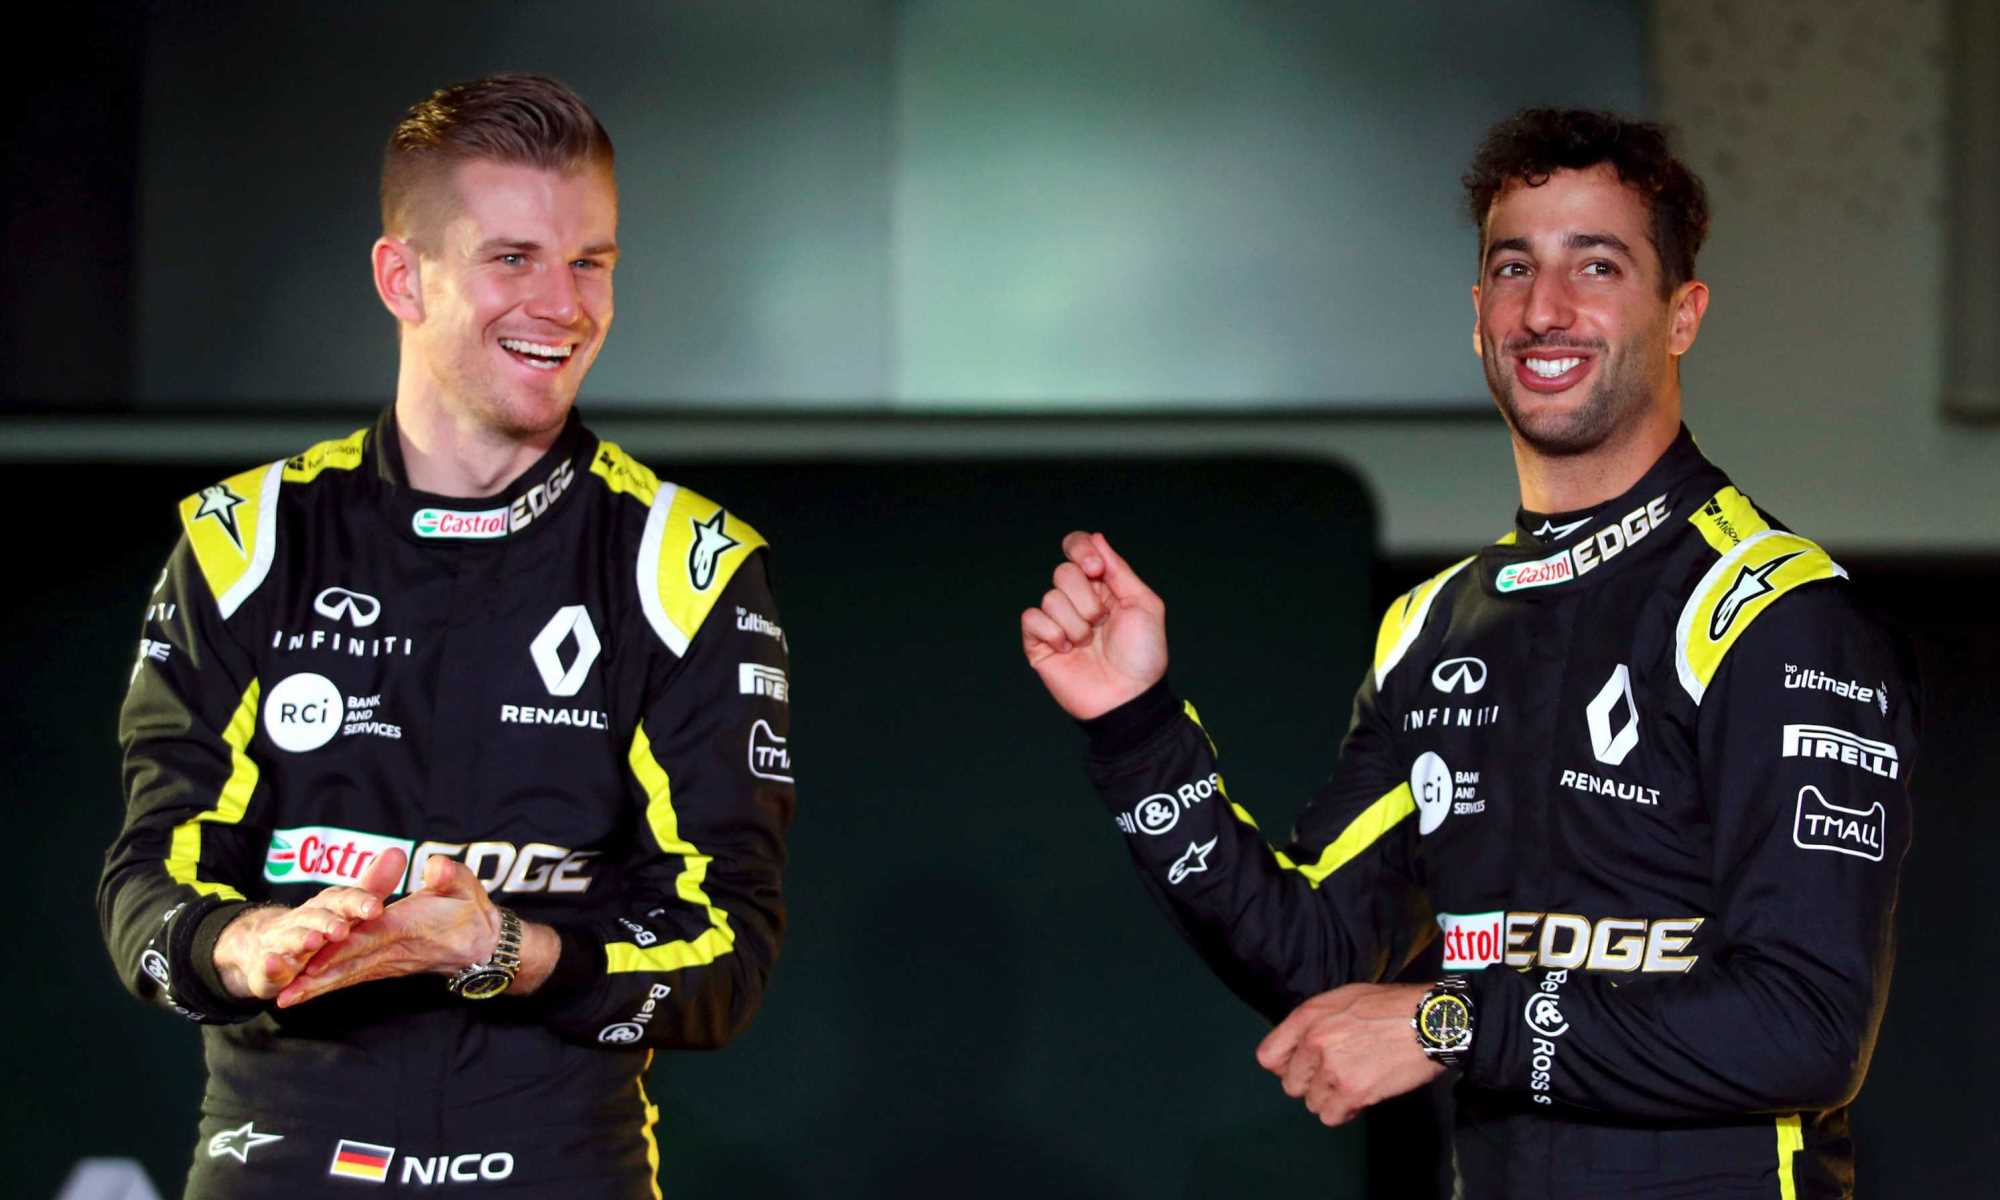 Daniel Ricciardo and Nico Hulkenberg